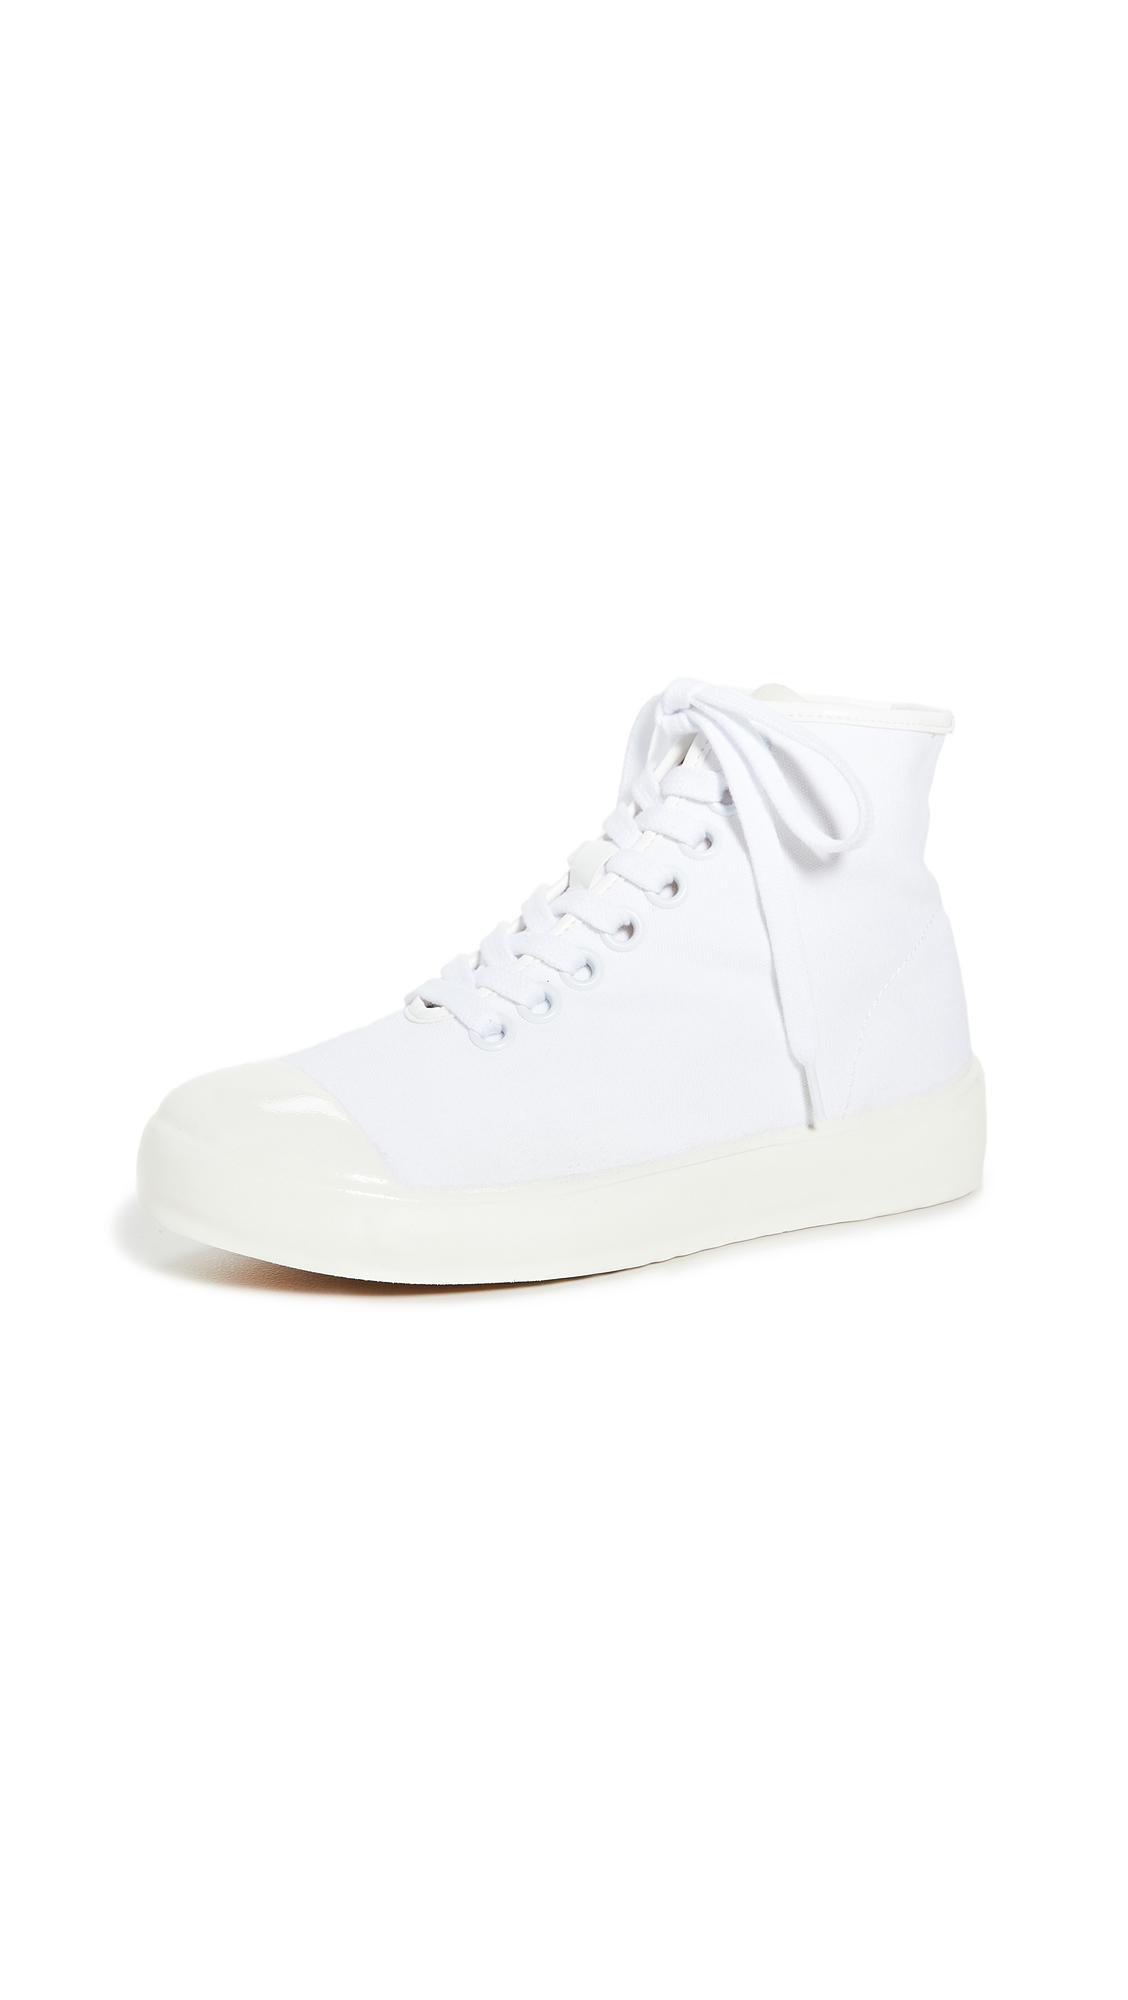 Marni High Top Sneakers – 60% Off Sale